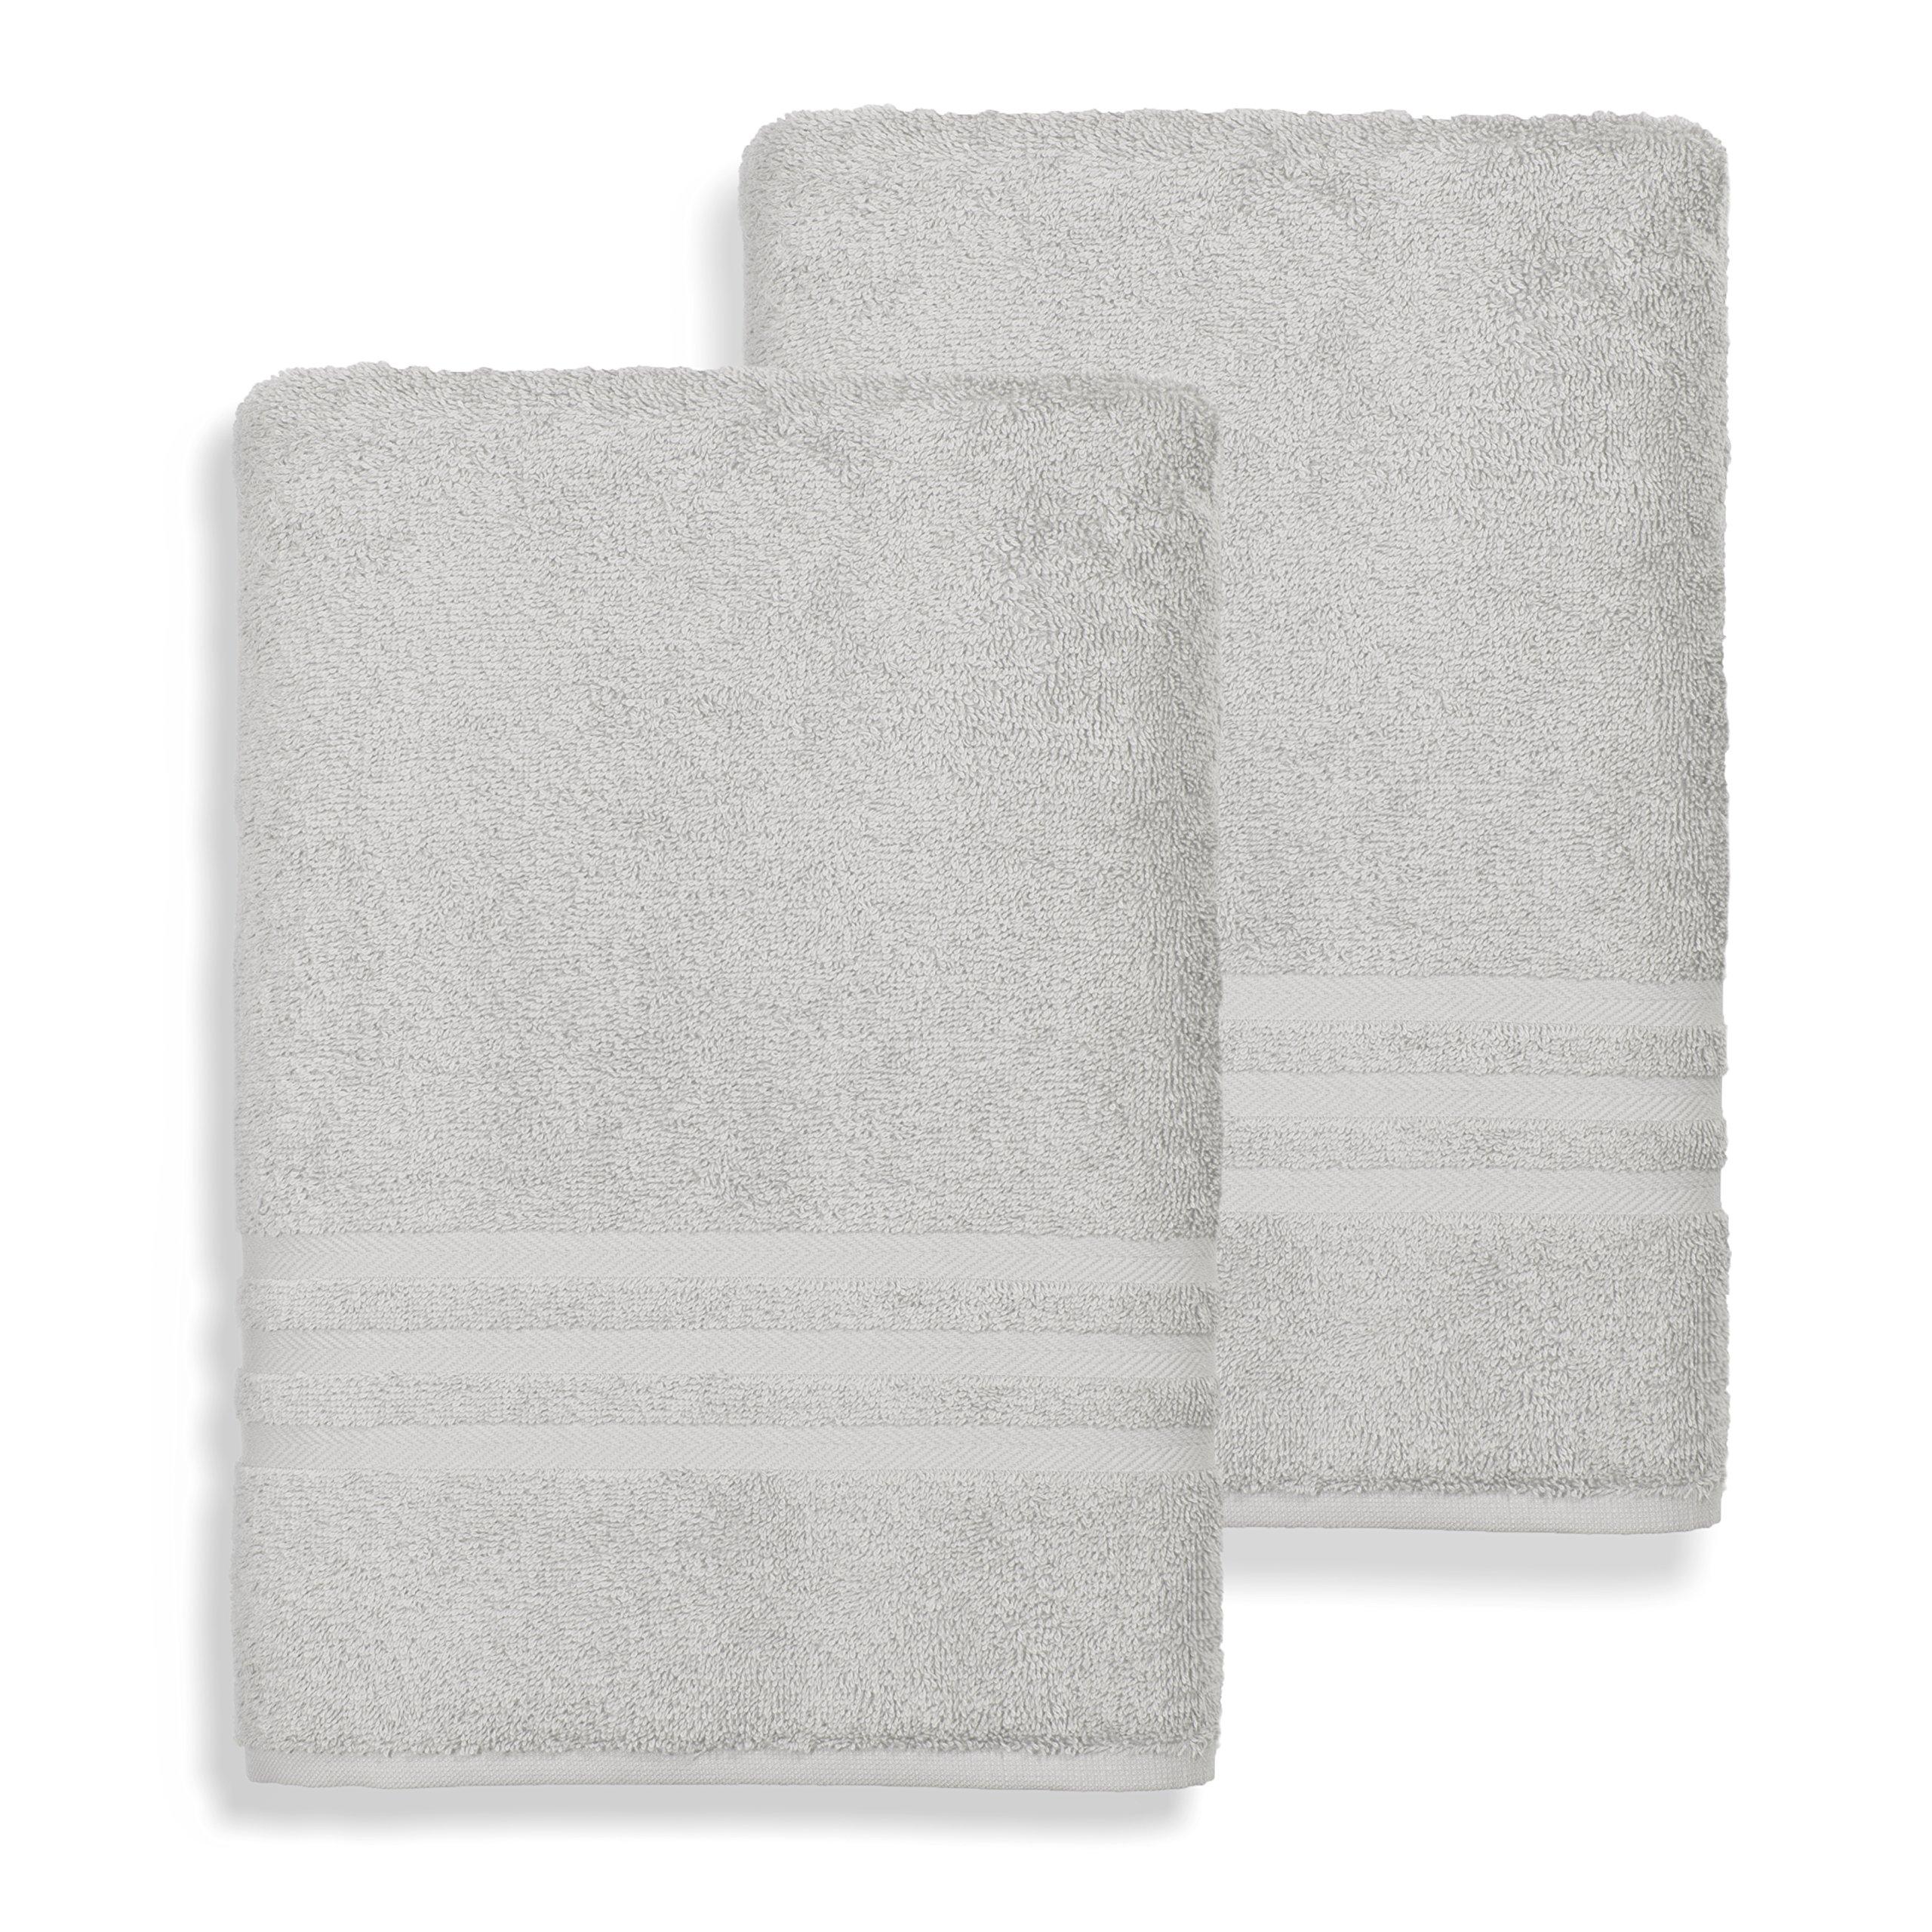 Linum Home Textiles 100% Turkish Cotton Denzi Bath Sheets, Set of 2, Light Grey